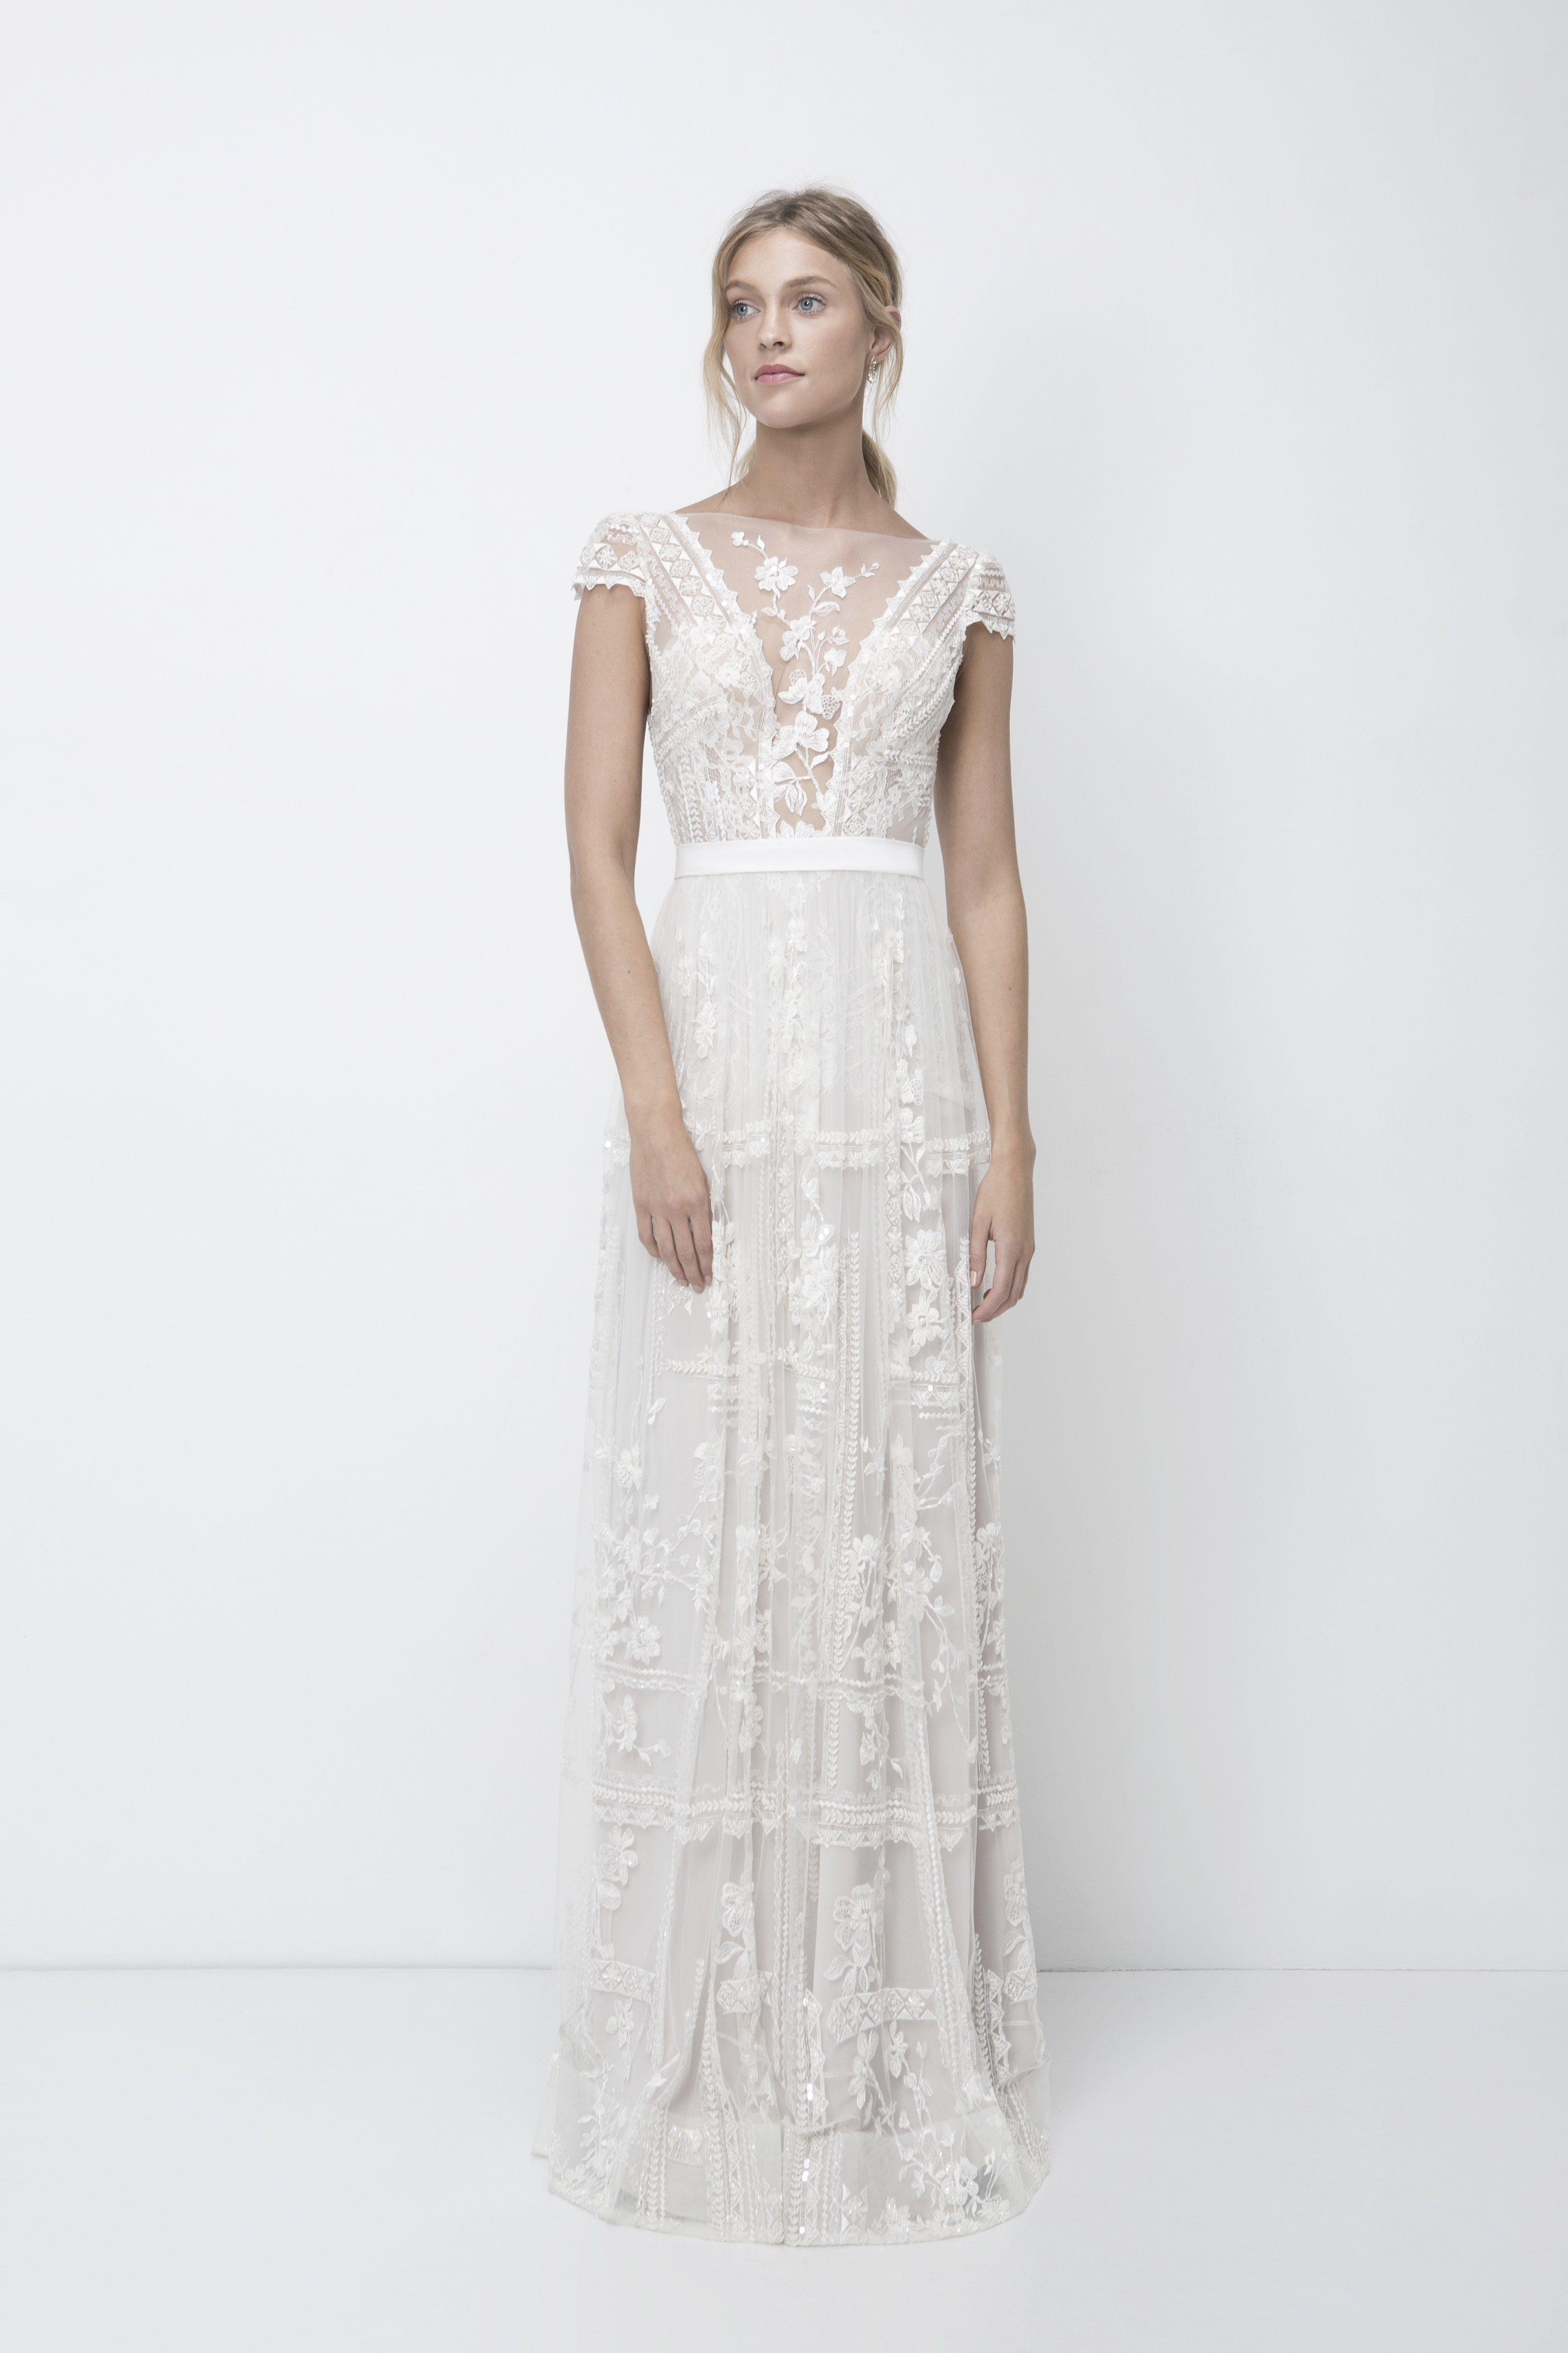 Lihi hod bridal u wedding dress collection fall brides